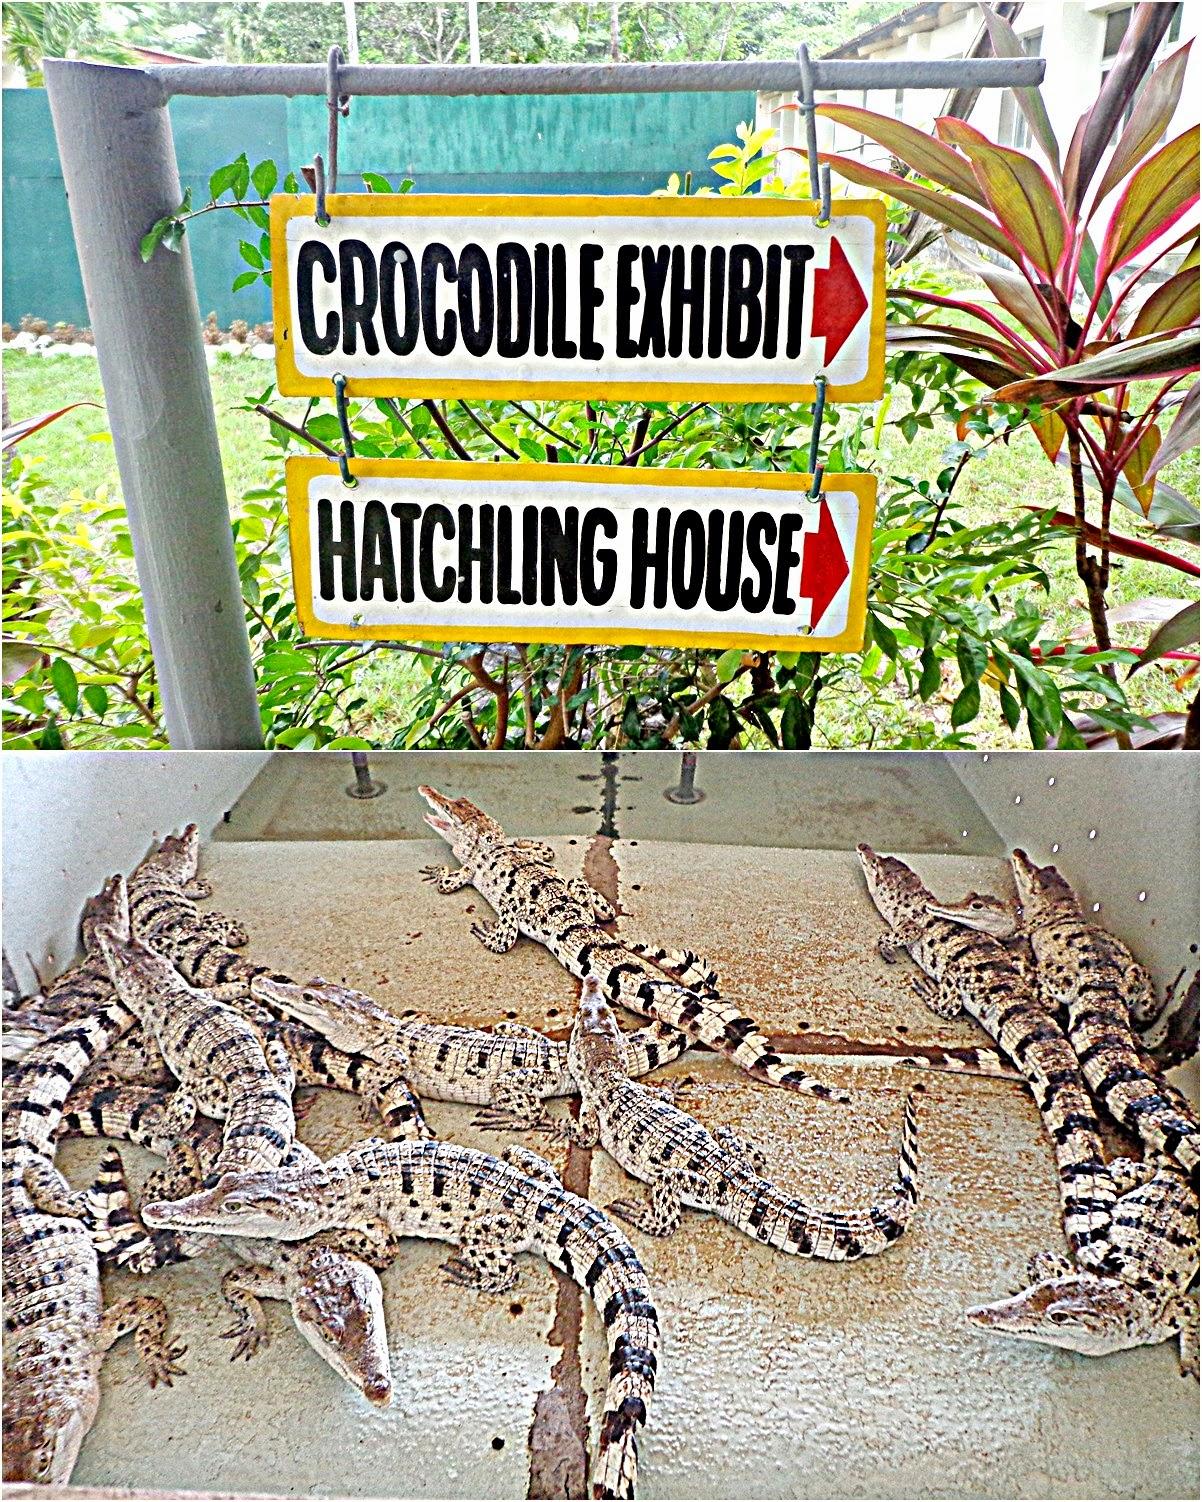 palawan crocodile farm, palawan wildlife rescue and conservation center